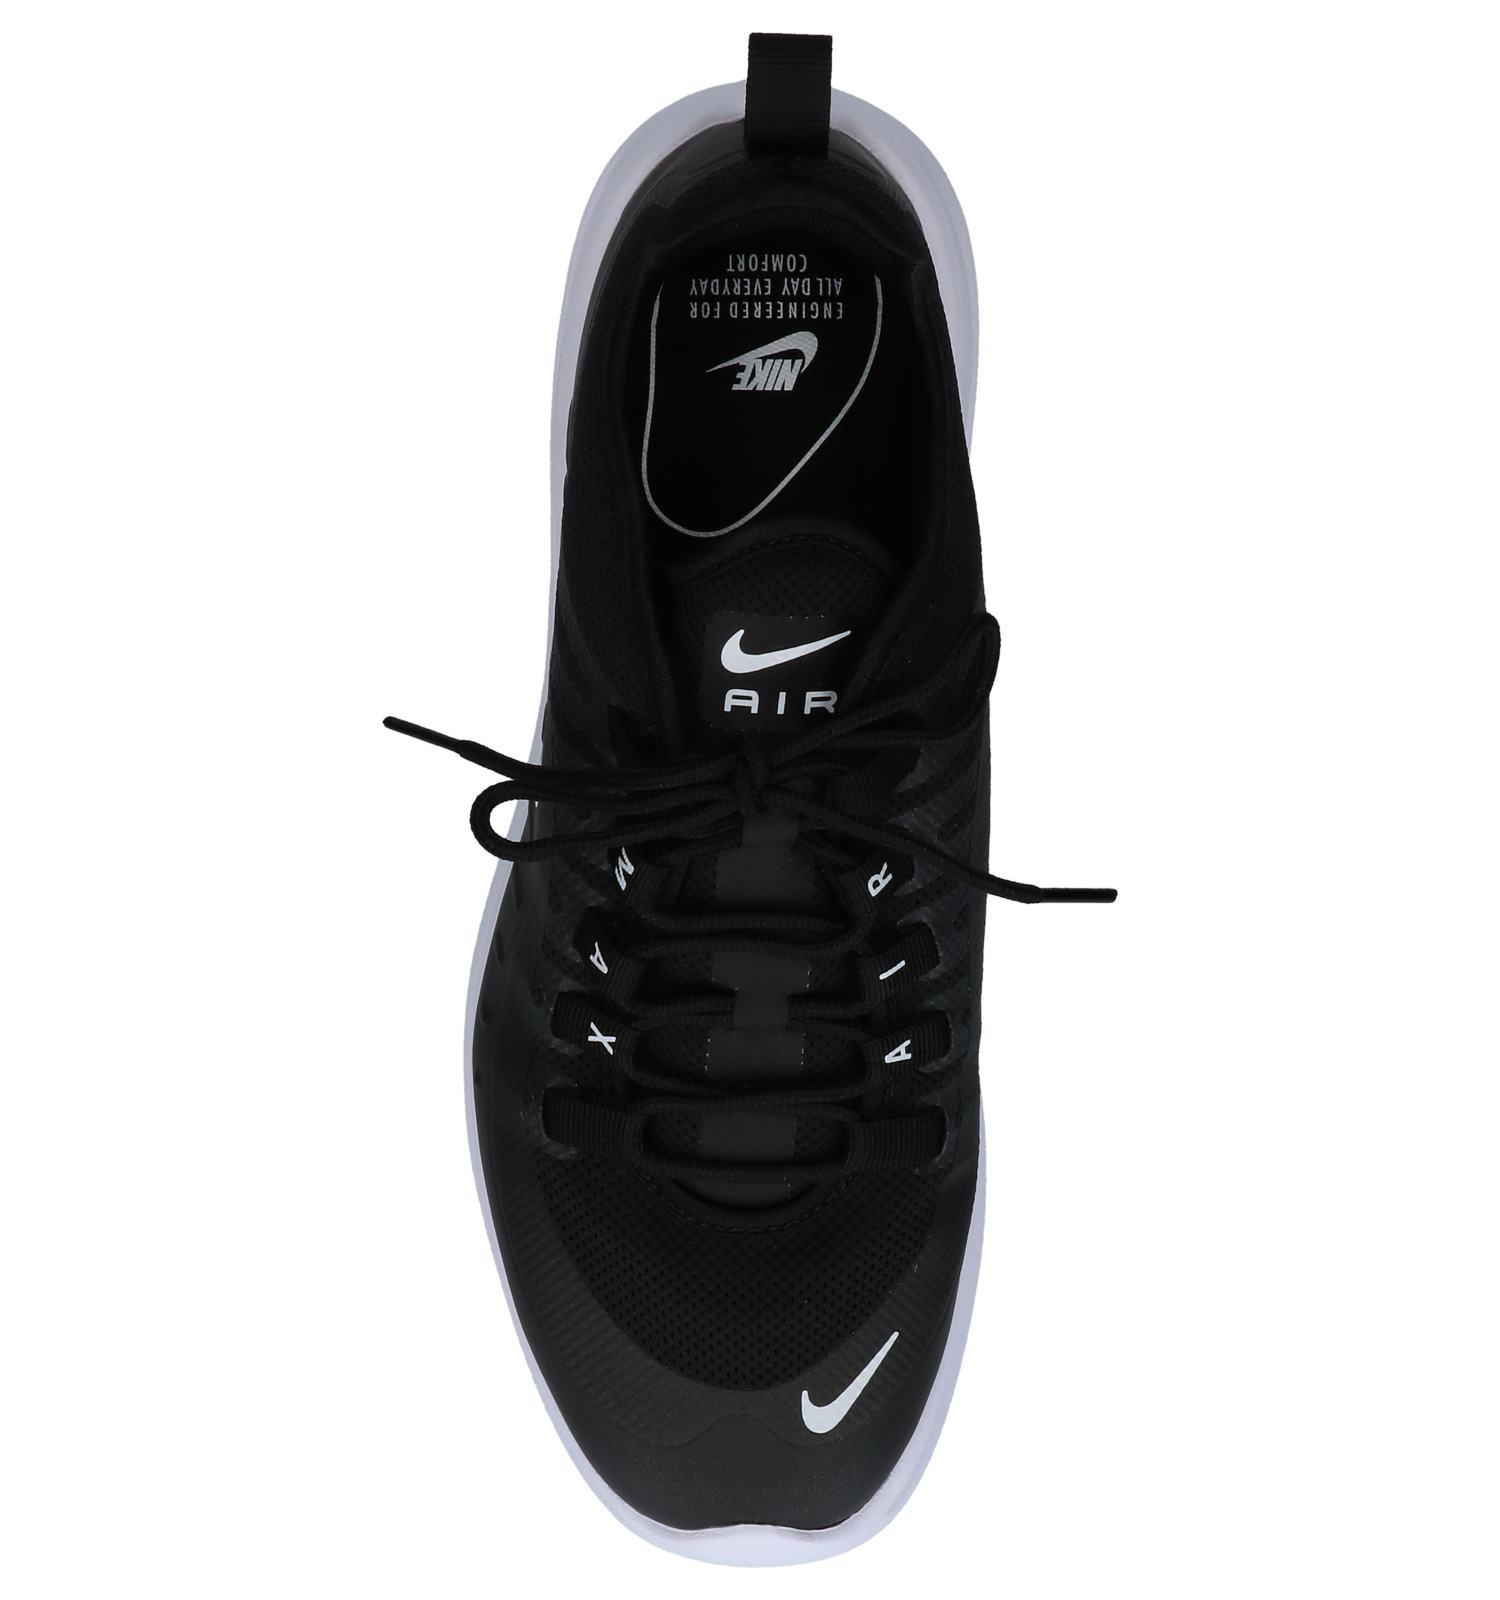 Max Air Nike Lage Sneakers Zwarte Axis c3uJTF1lK